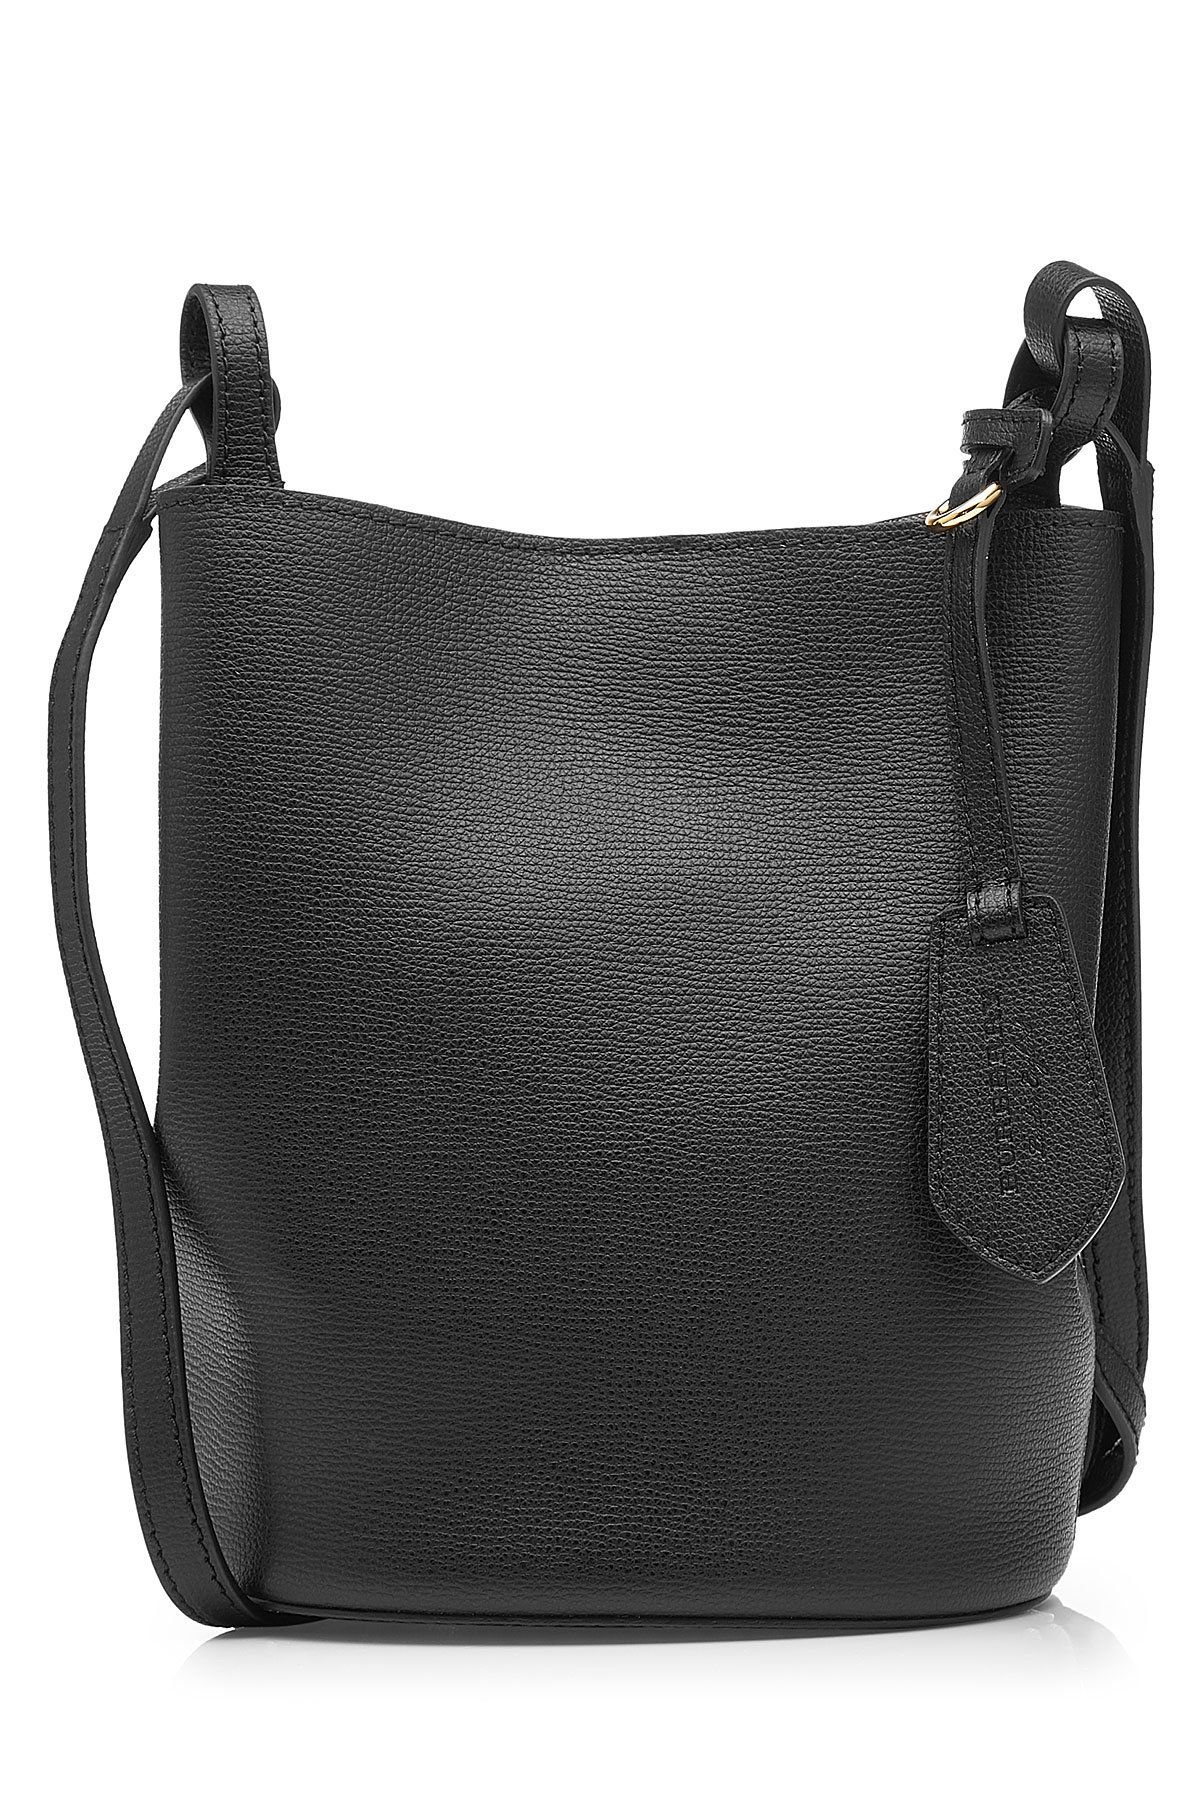 549483b7bc9f Burberry London England Leather Bucket Bag